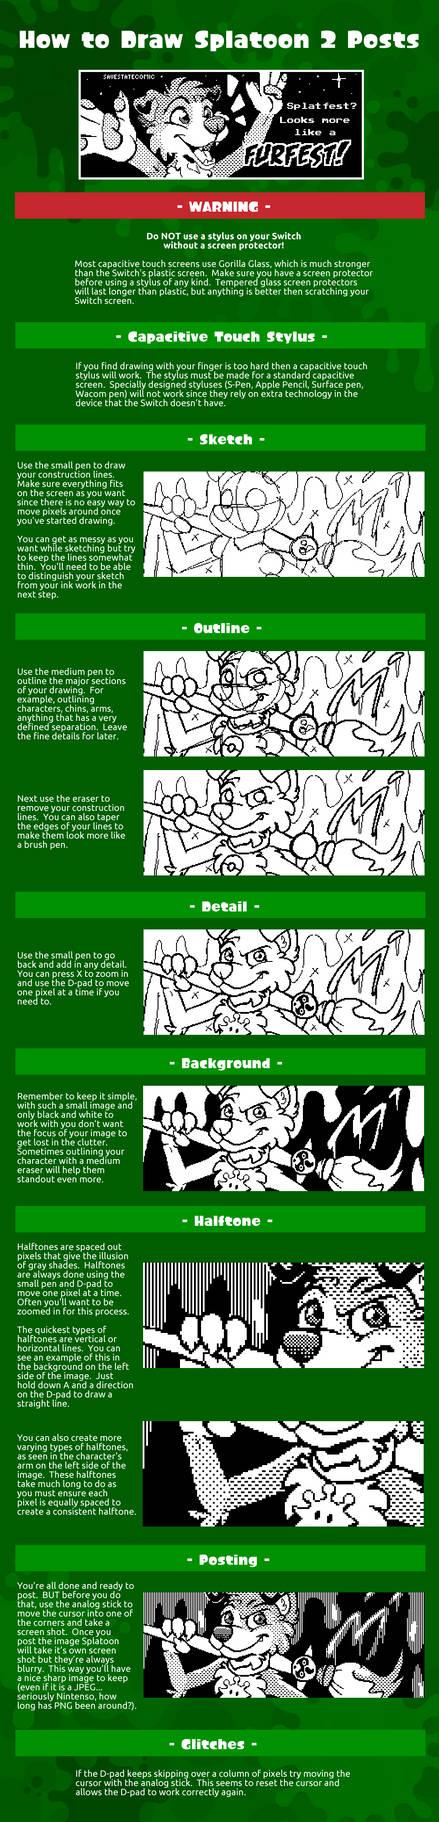 How to Draw Splatoon 2 Posts